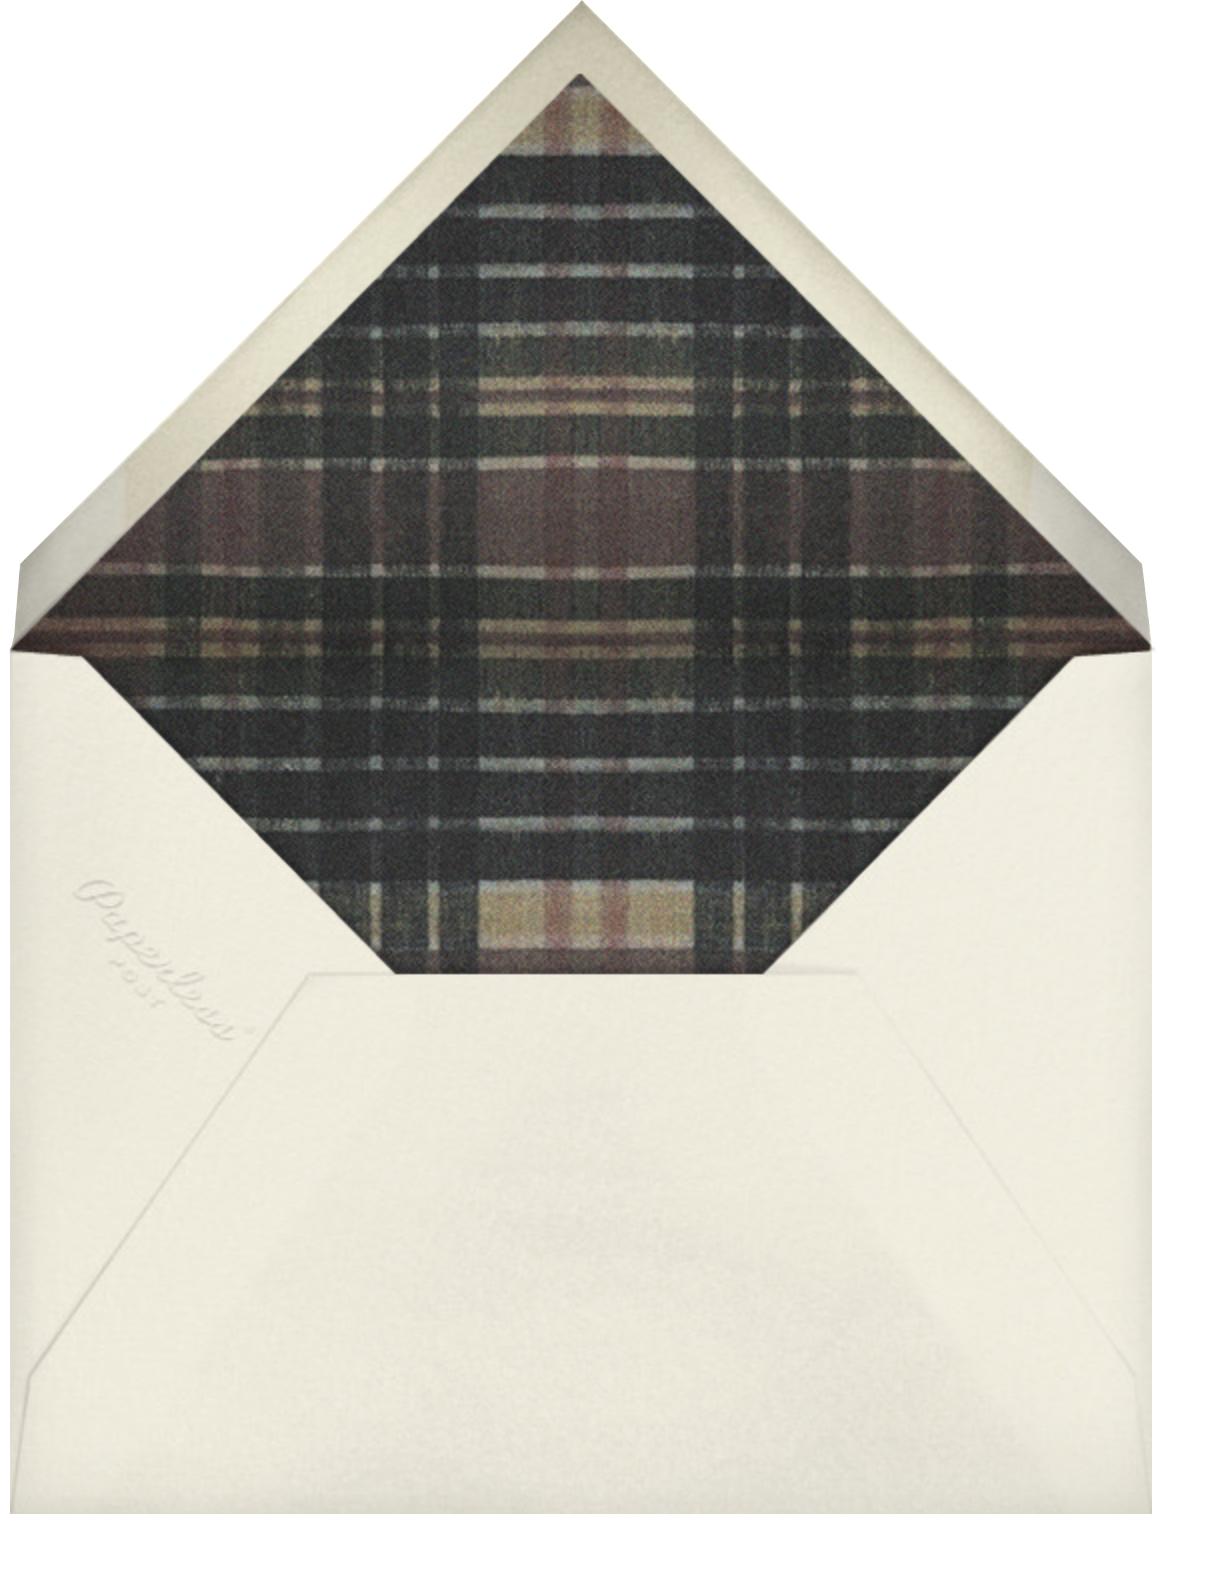 Sundance - Paperless Post - Winter parties - envelope back